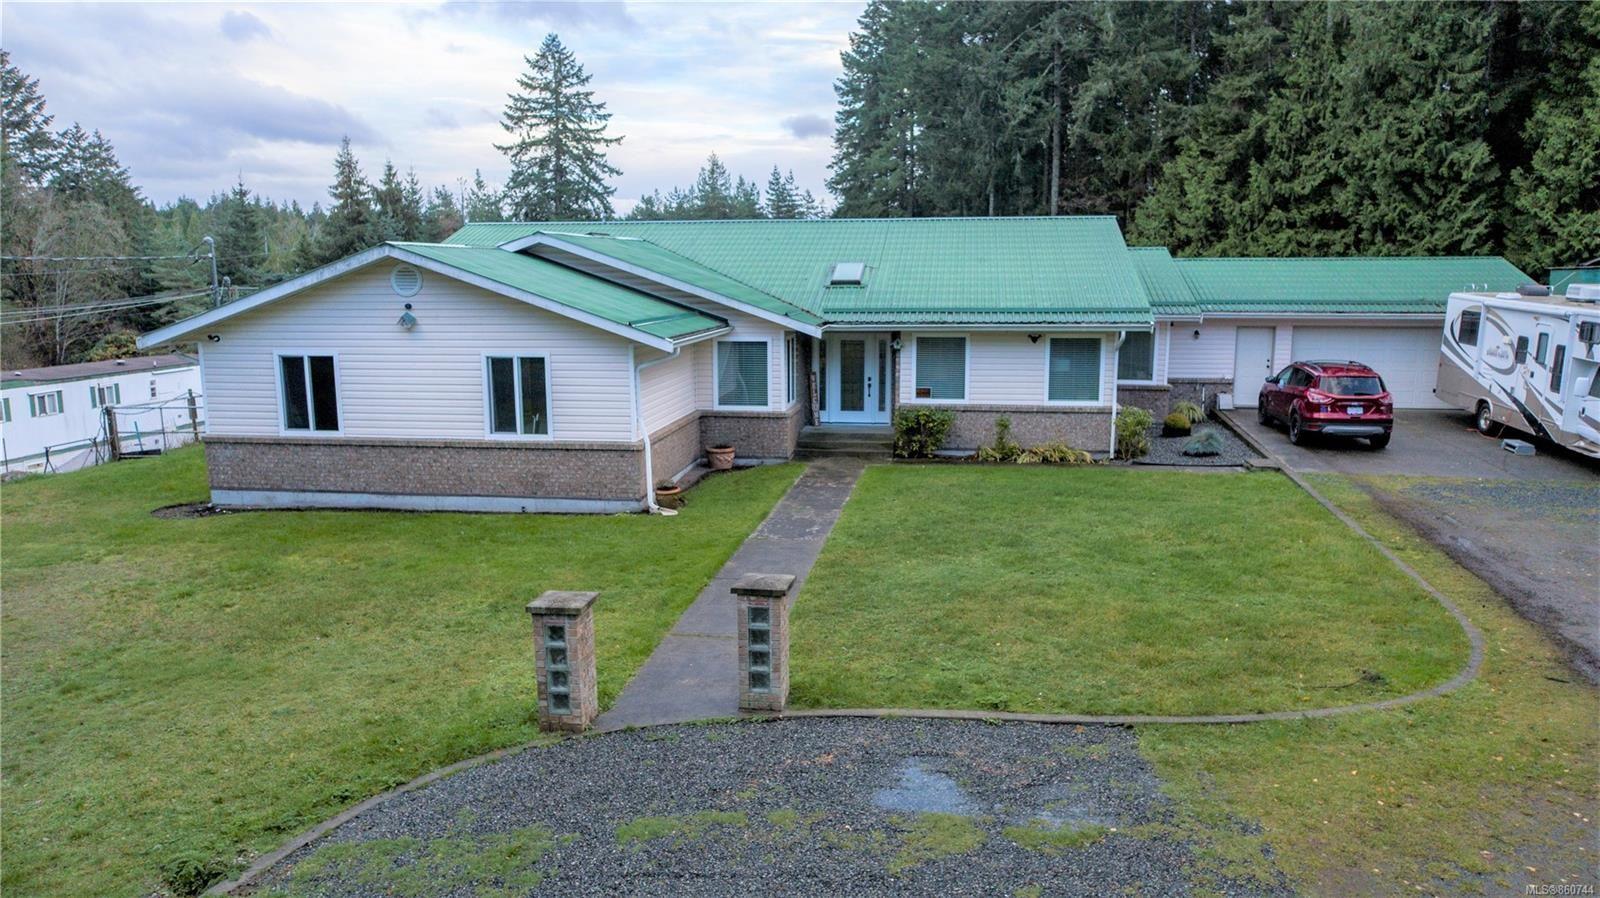 Main Photo: 3175 Farrar Rd in : Na Cedar House for sale (Nanaimo)  : MLS®# 860744